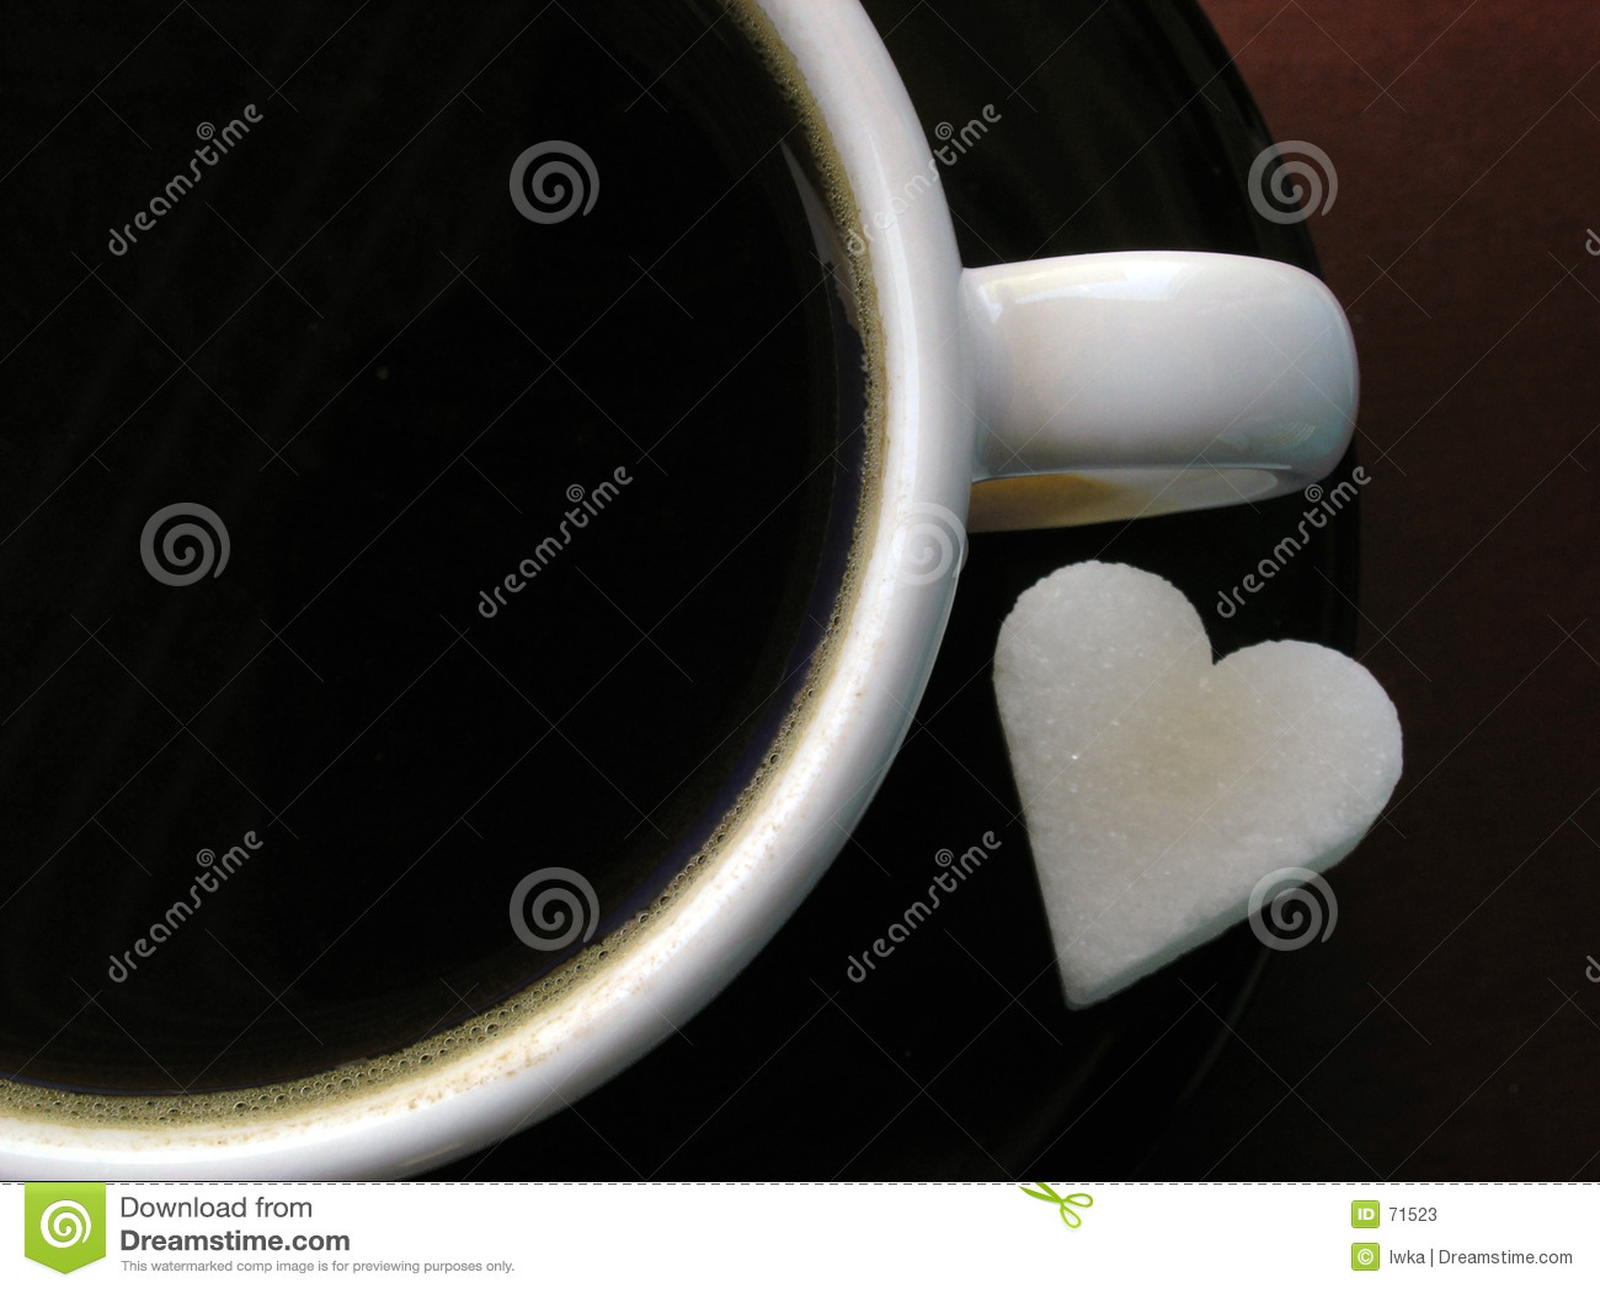 Coffee cup & sugar